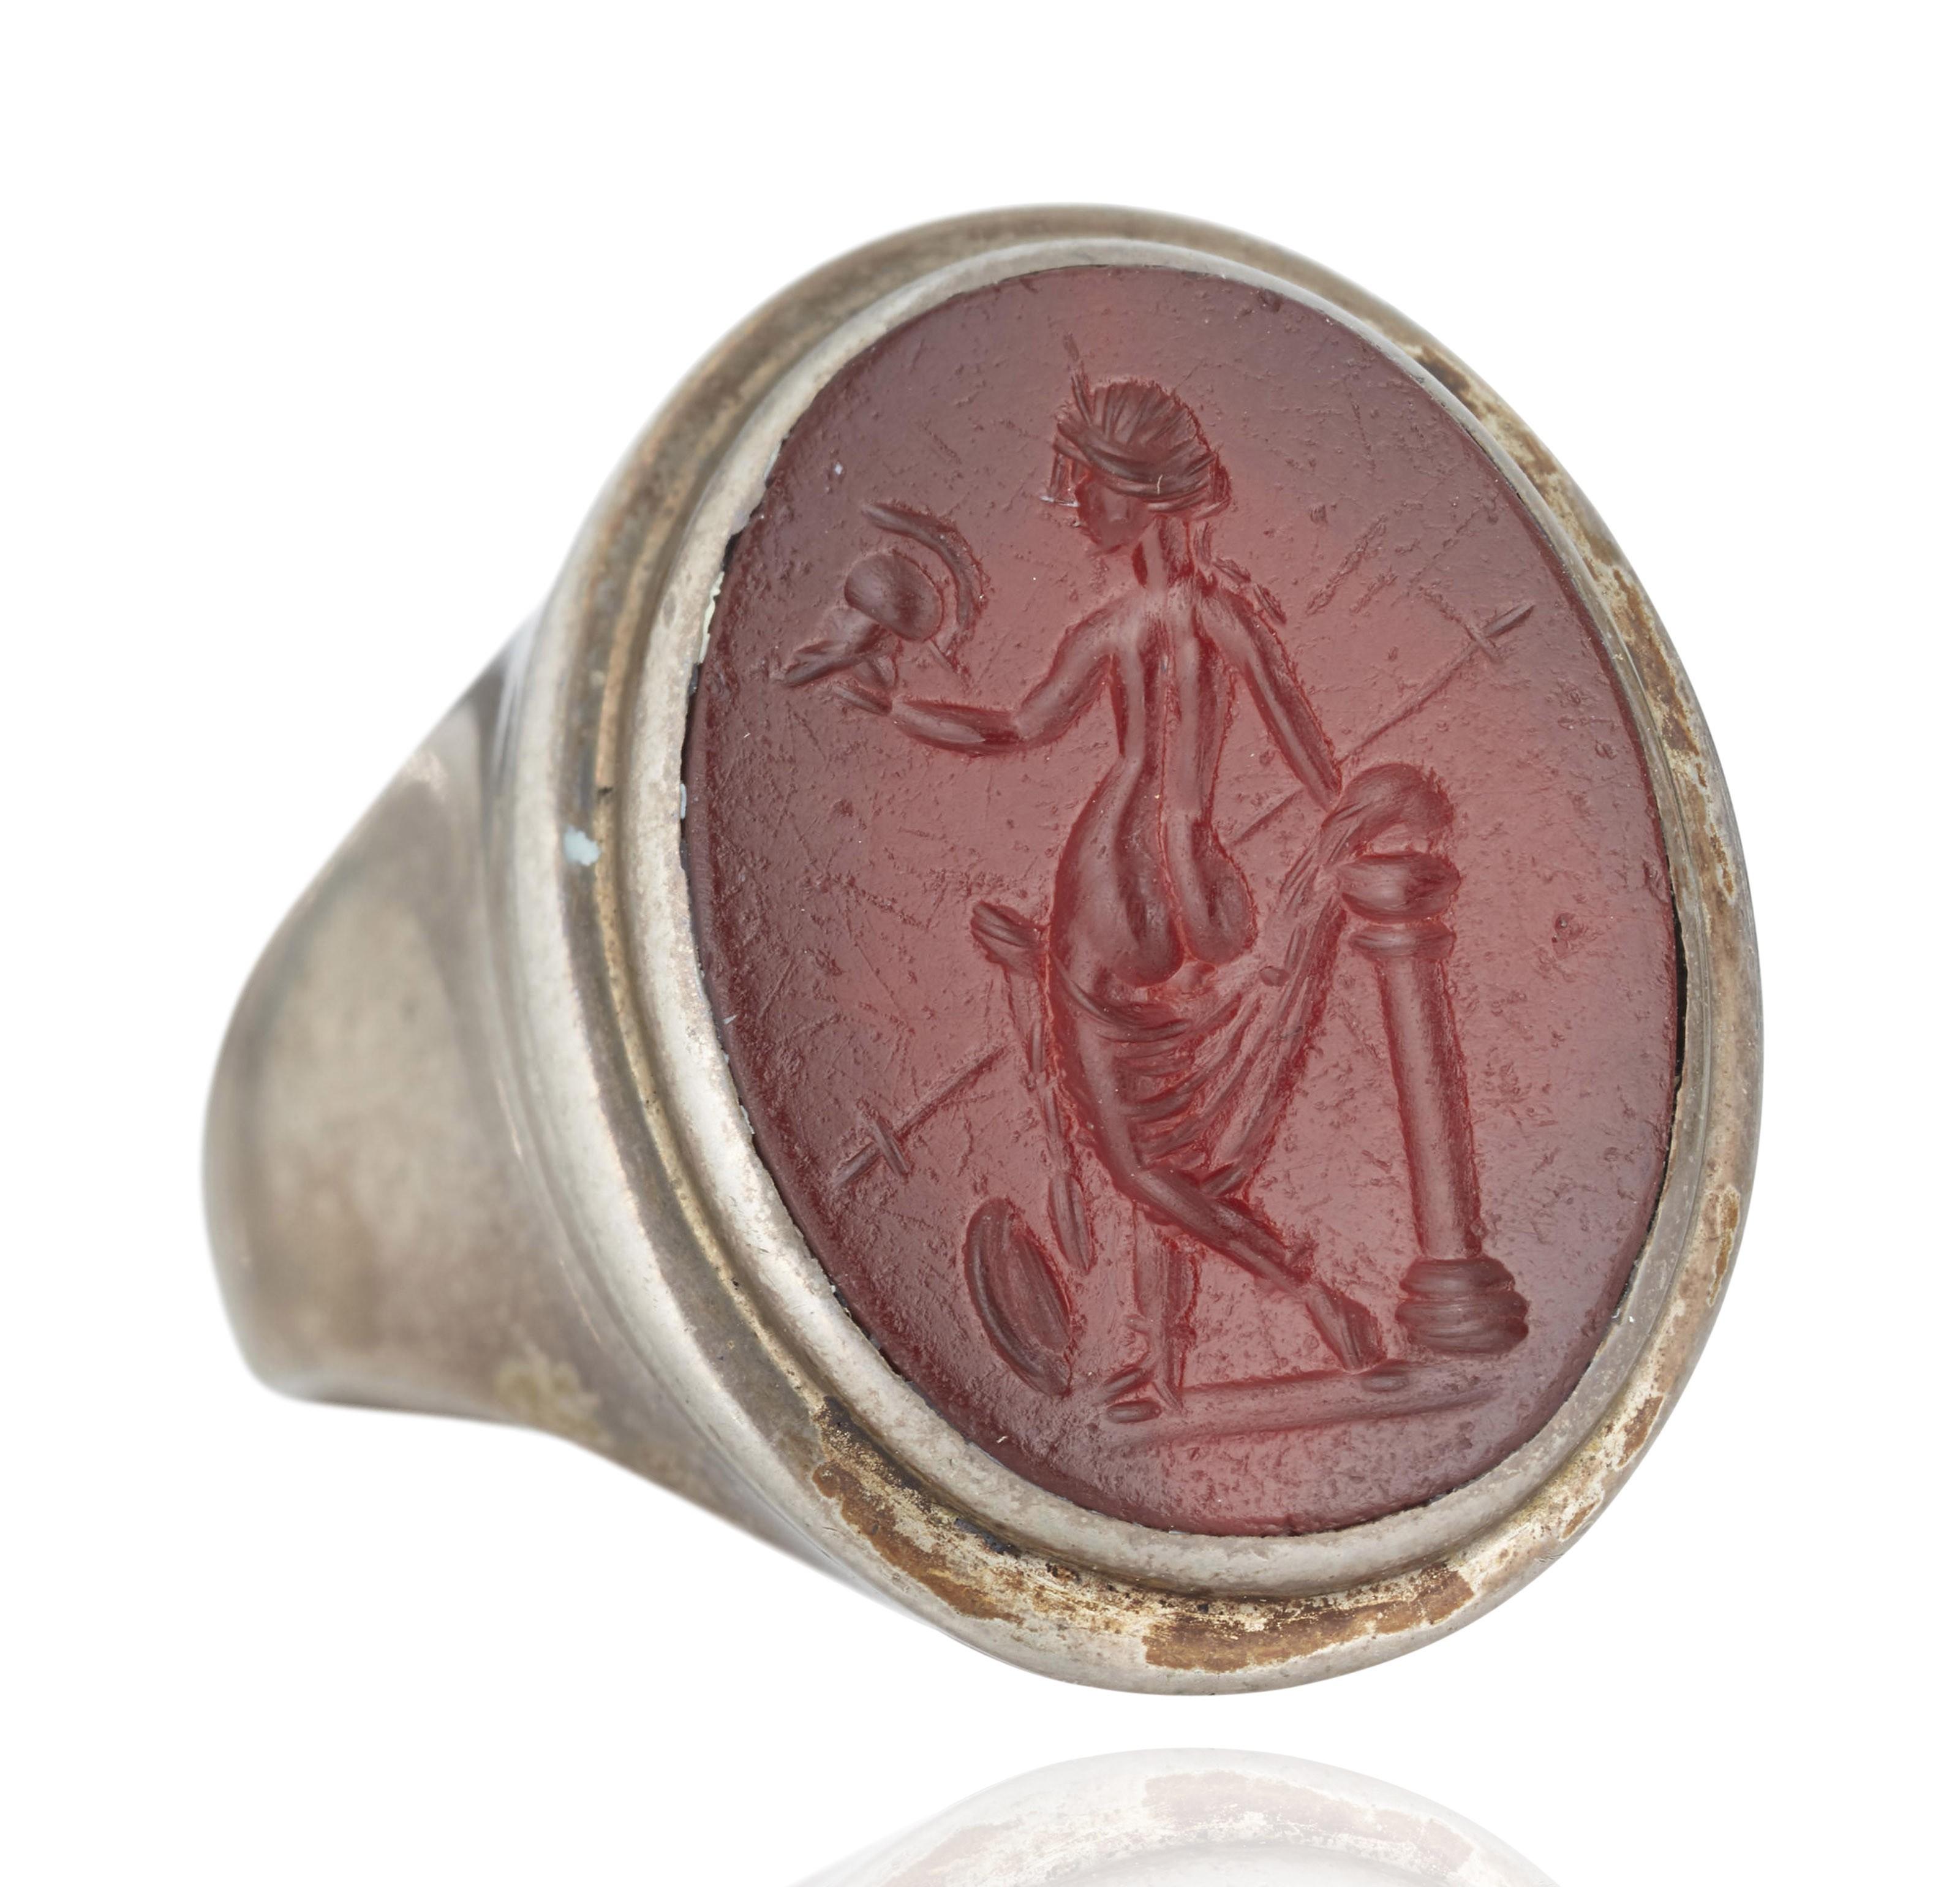 A ROMAN RED JASPER RINGSTONE WITH VENUS VICTRIX